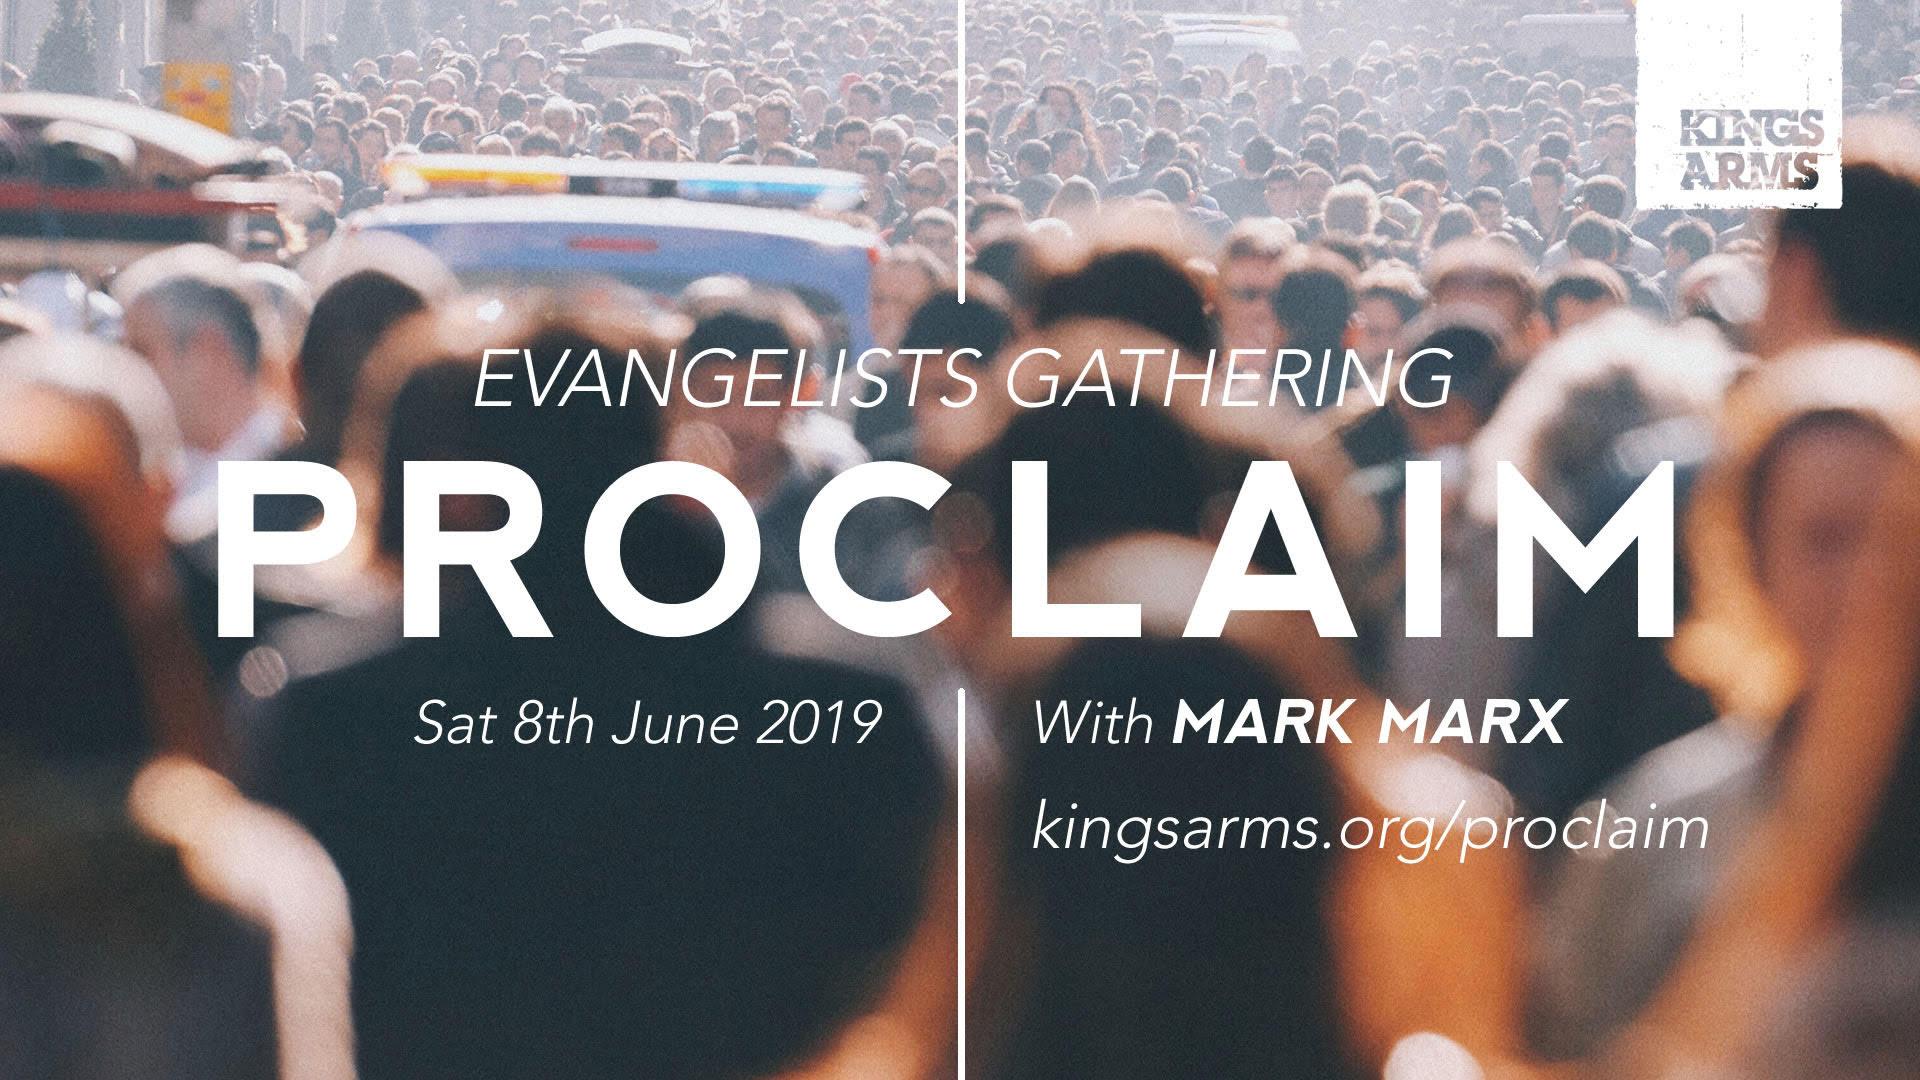 Proclaim Evangelists Gathering